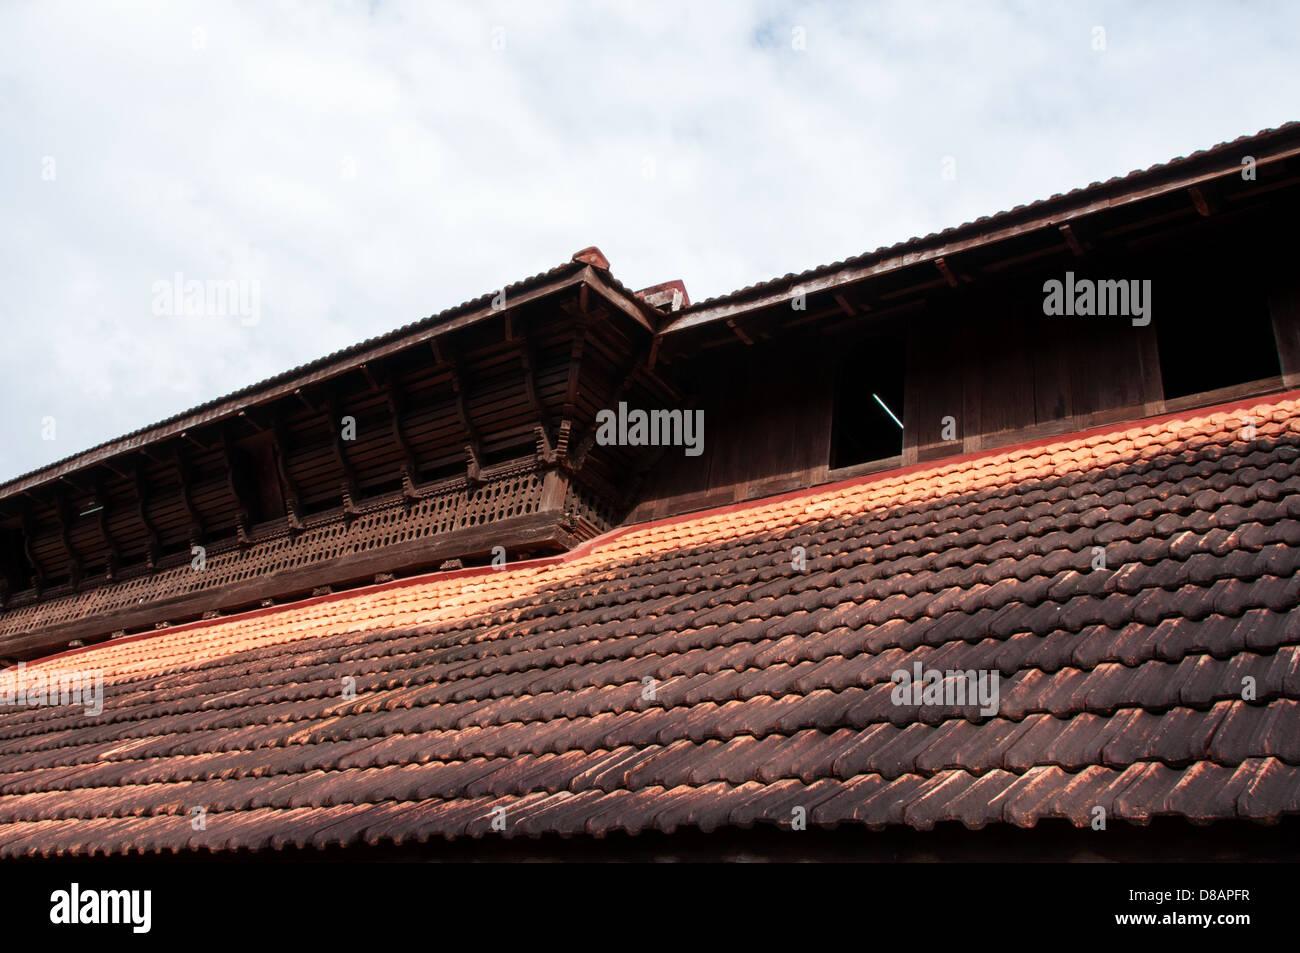 Stock Photo - Traditional roof tiles India & Traditional roof tiles India Stock Photo Royalty Free Image ... memphite.com